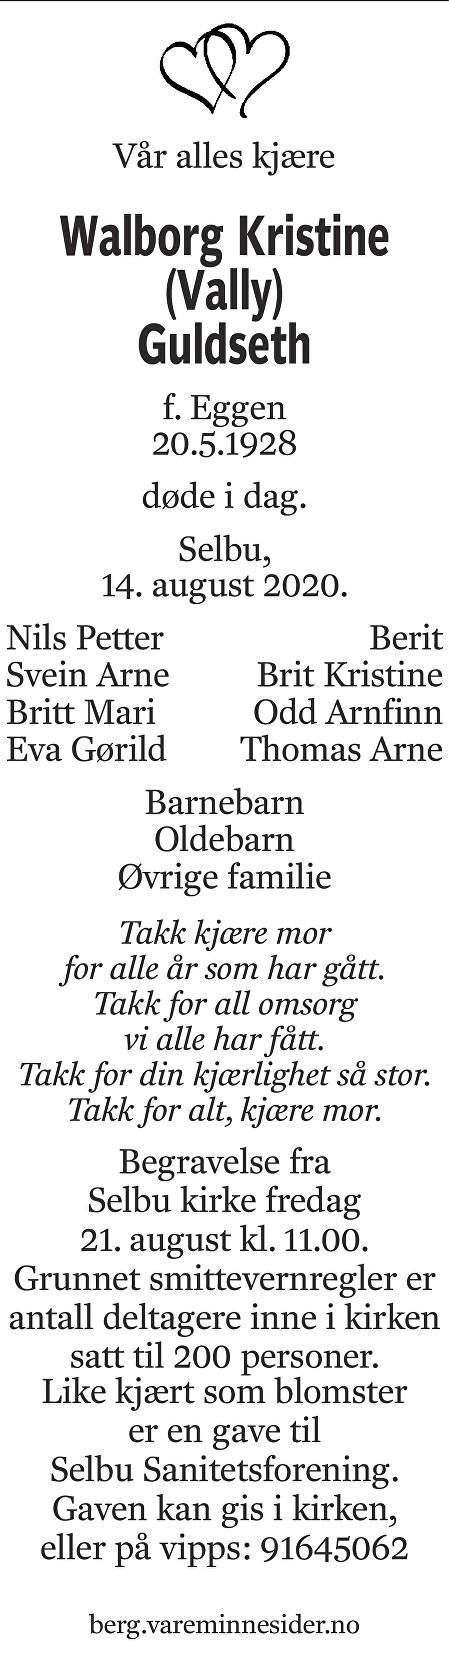 Walborg Kristine Guldseth Dødsannonse